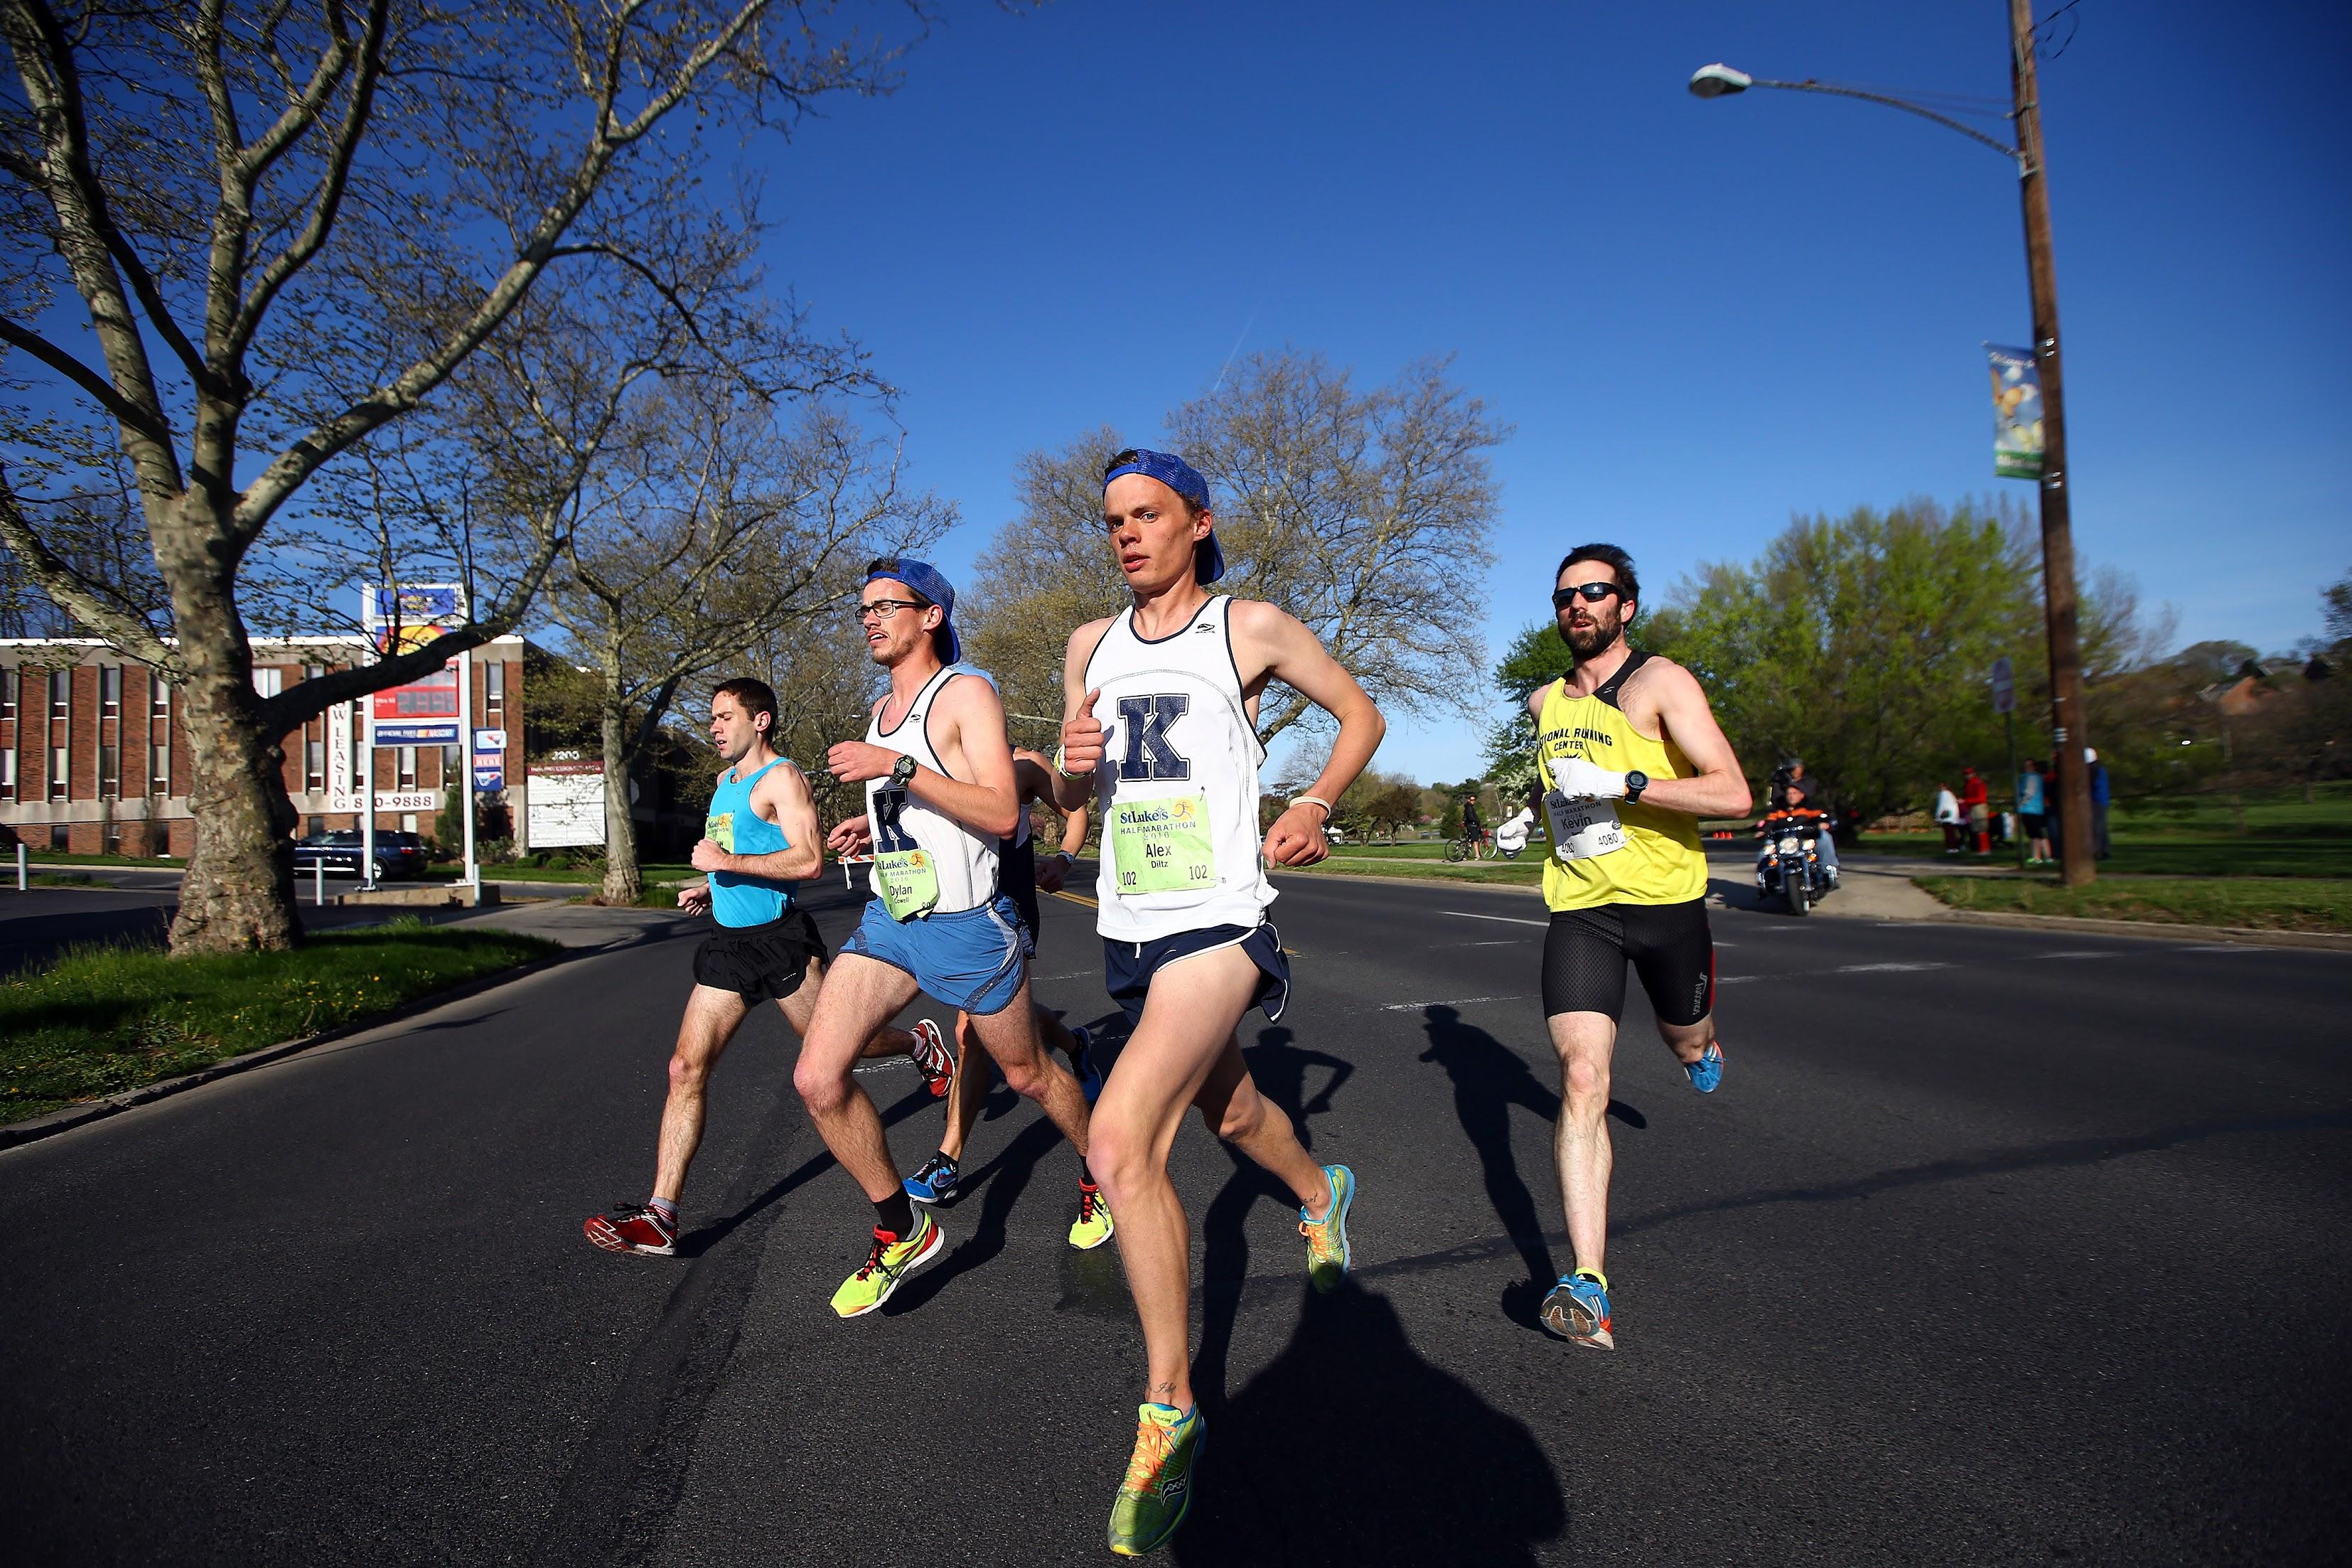 St. Luke's Half Marathon